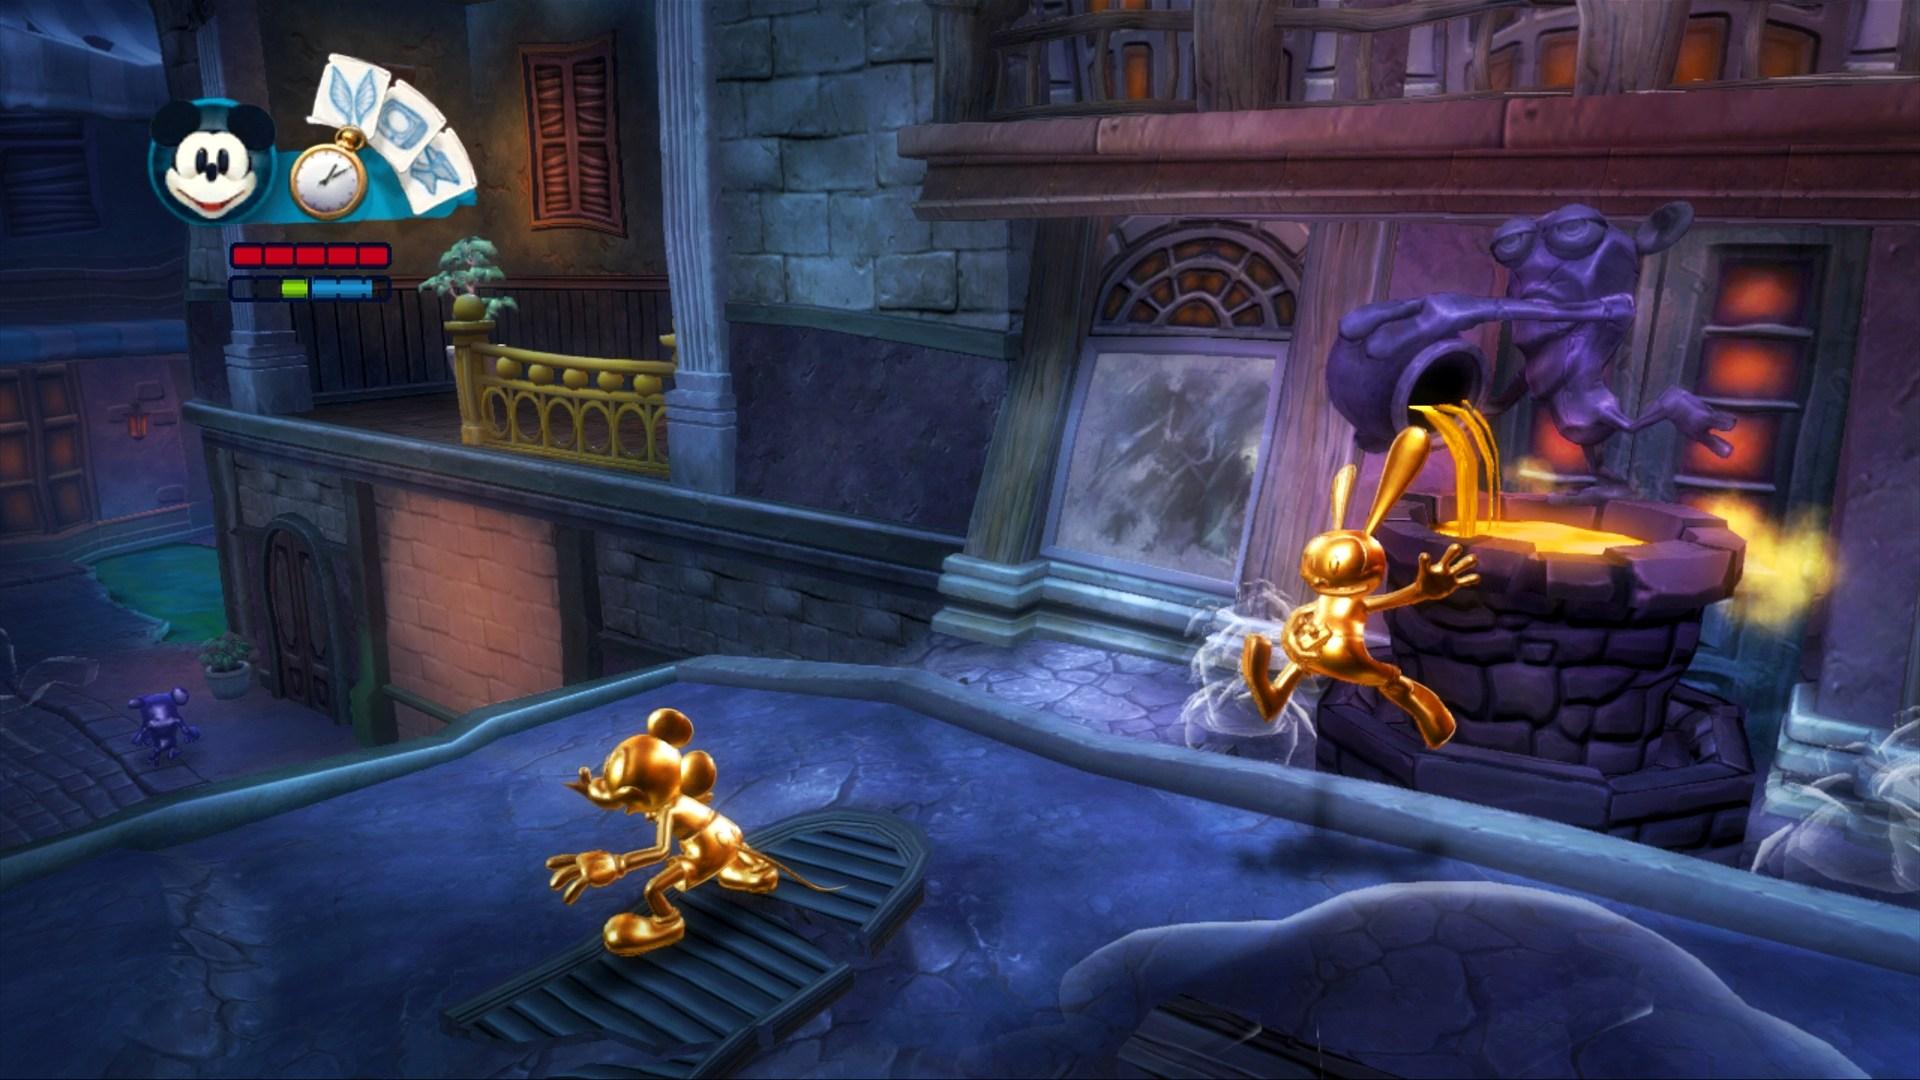 Скриншот Disney Epic Mickey 2: The Power of Two